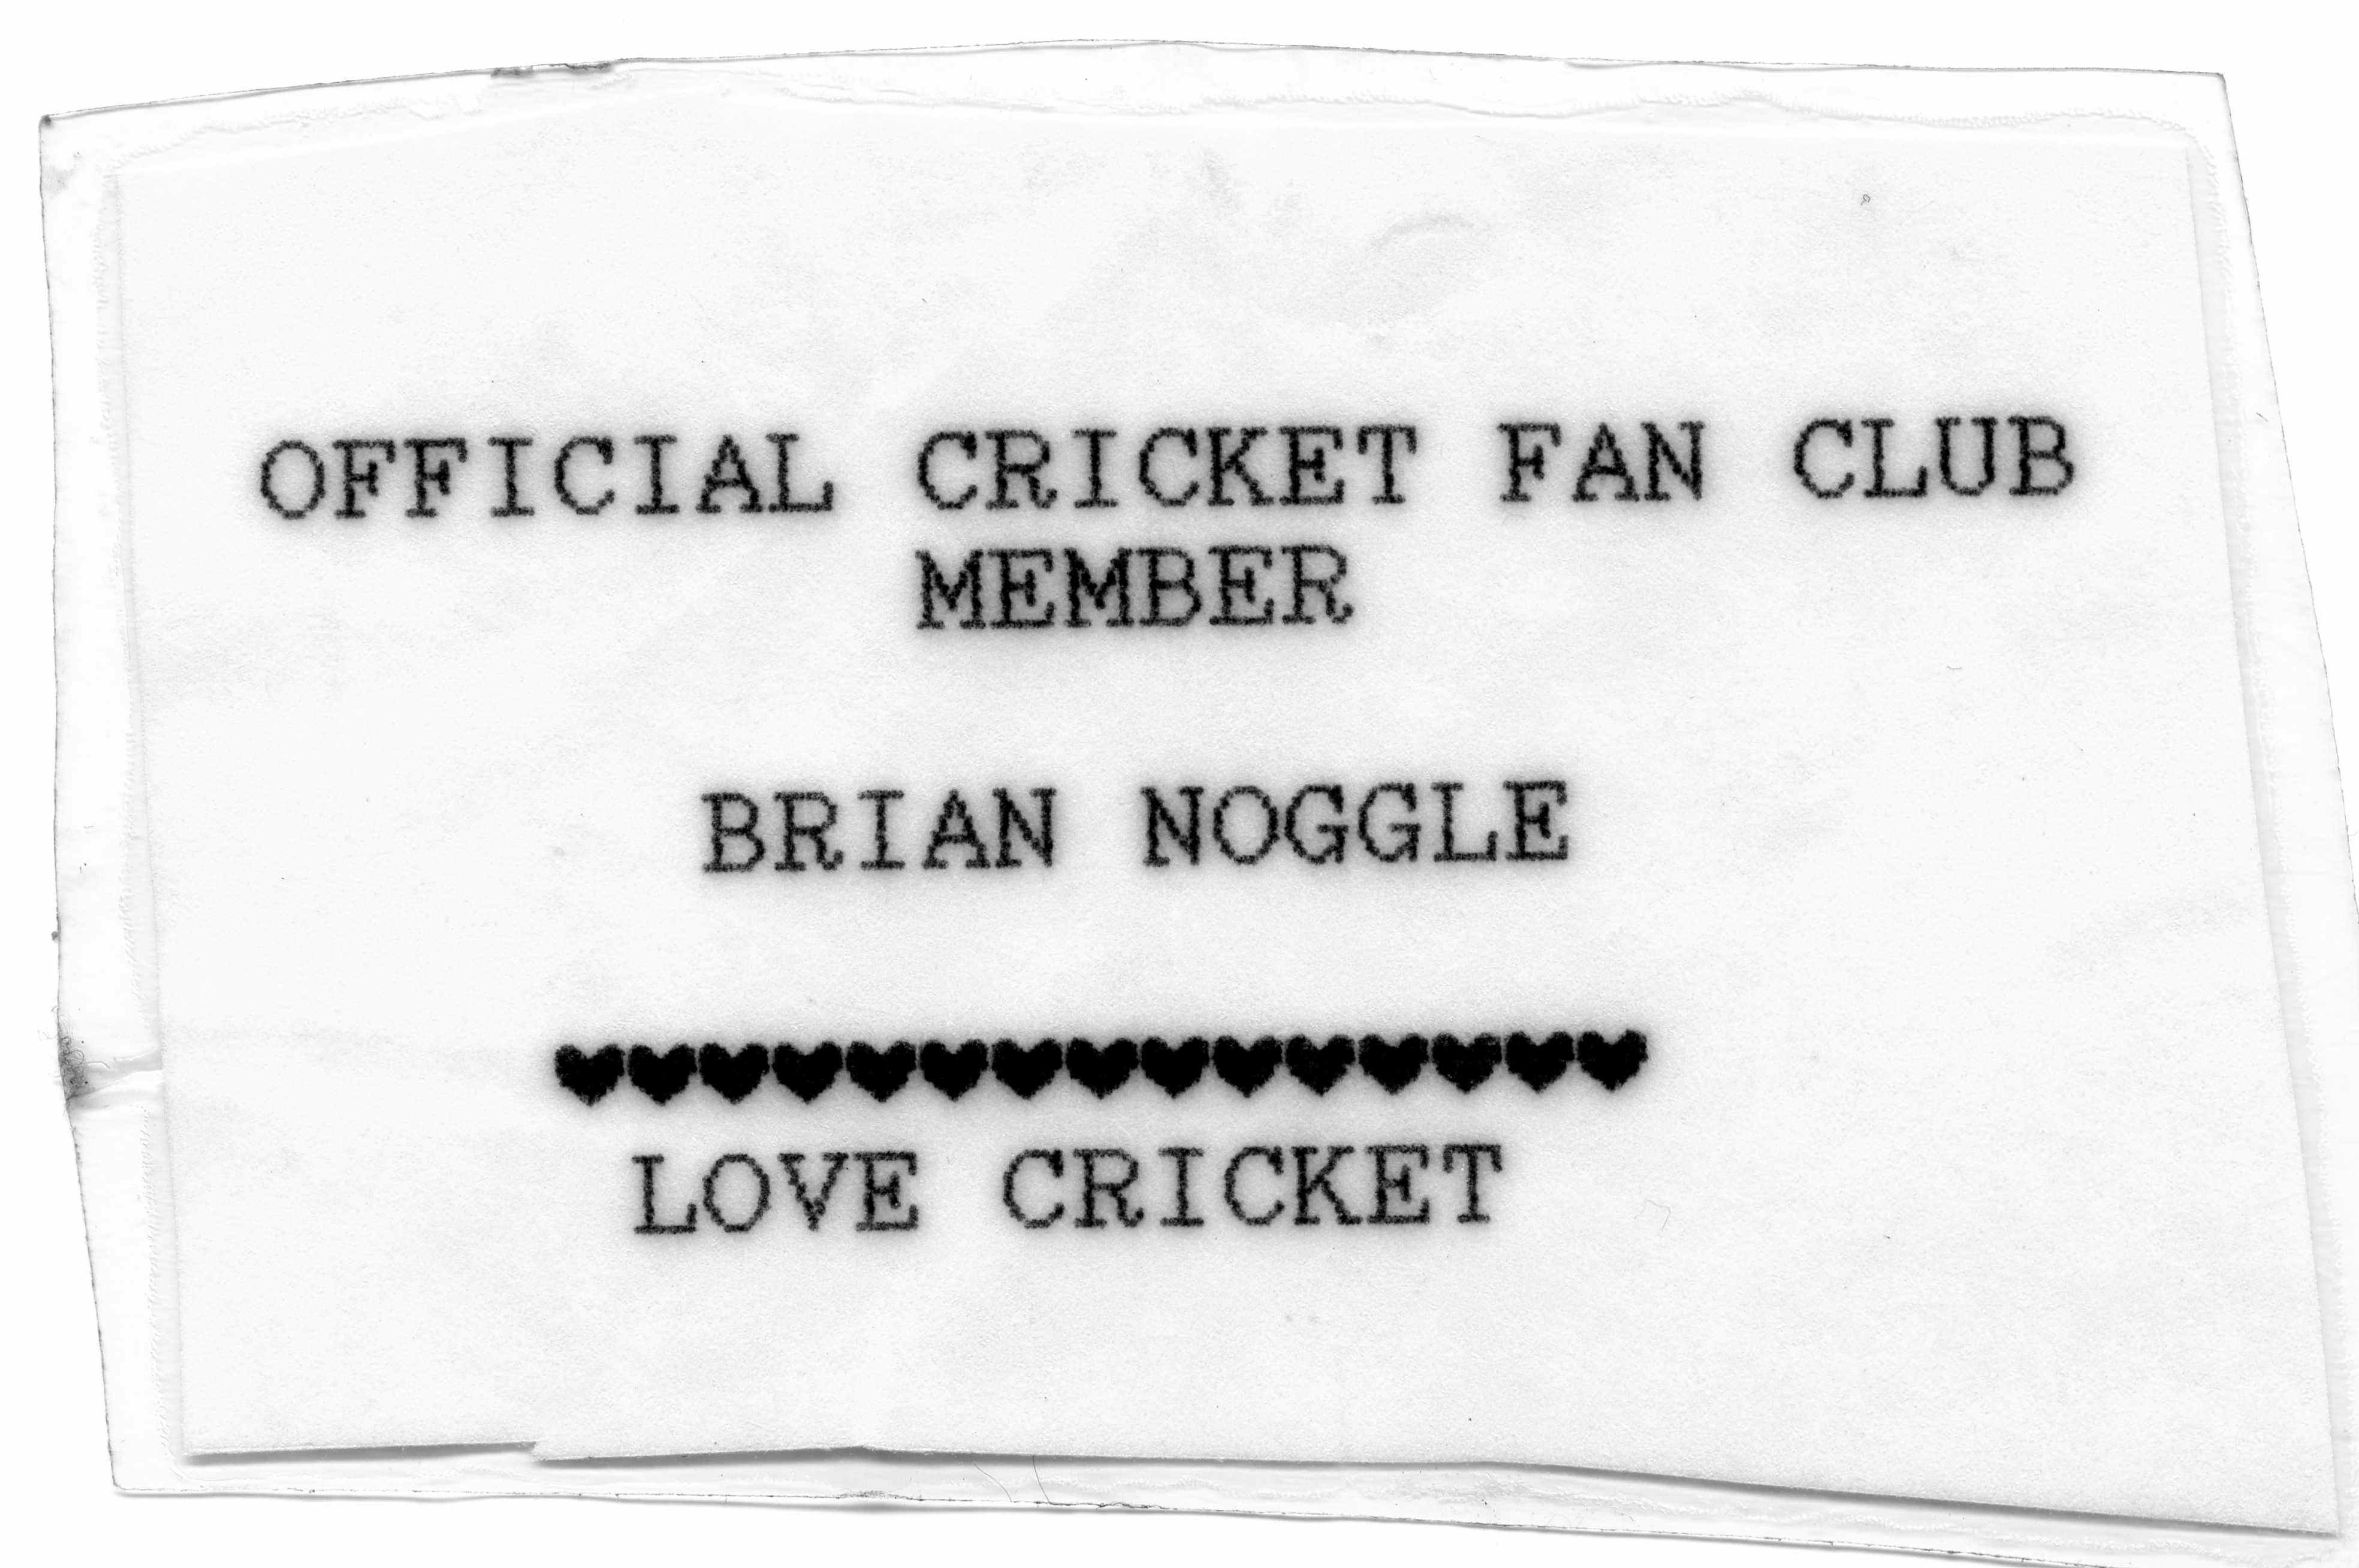 Cricket fan club membership